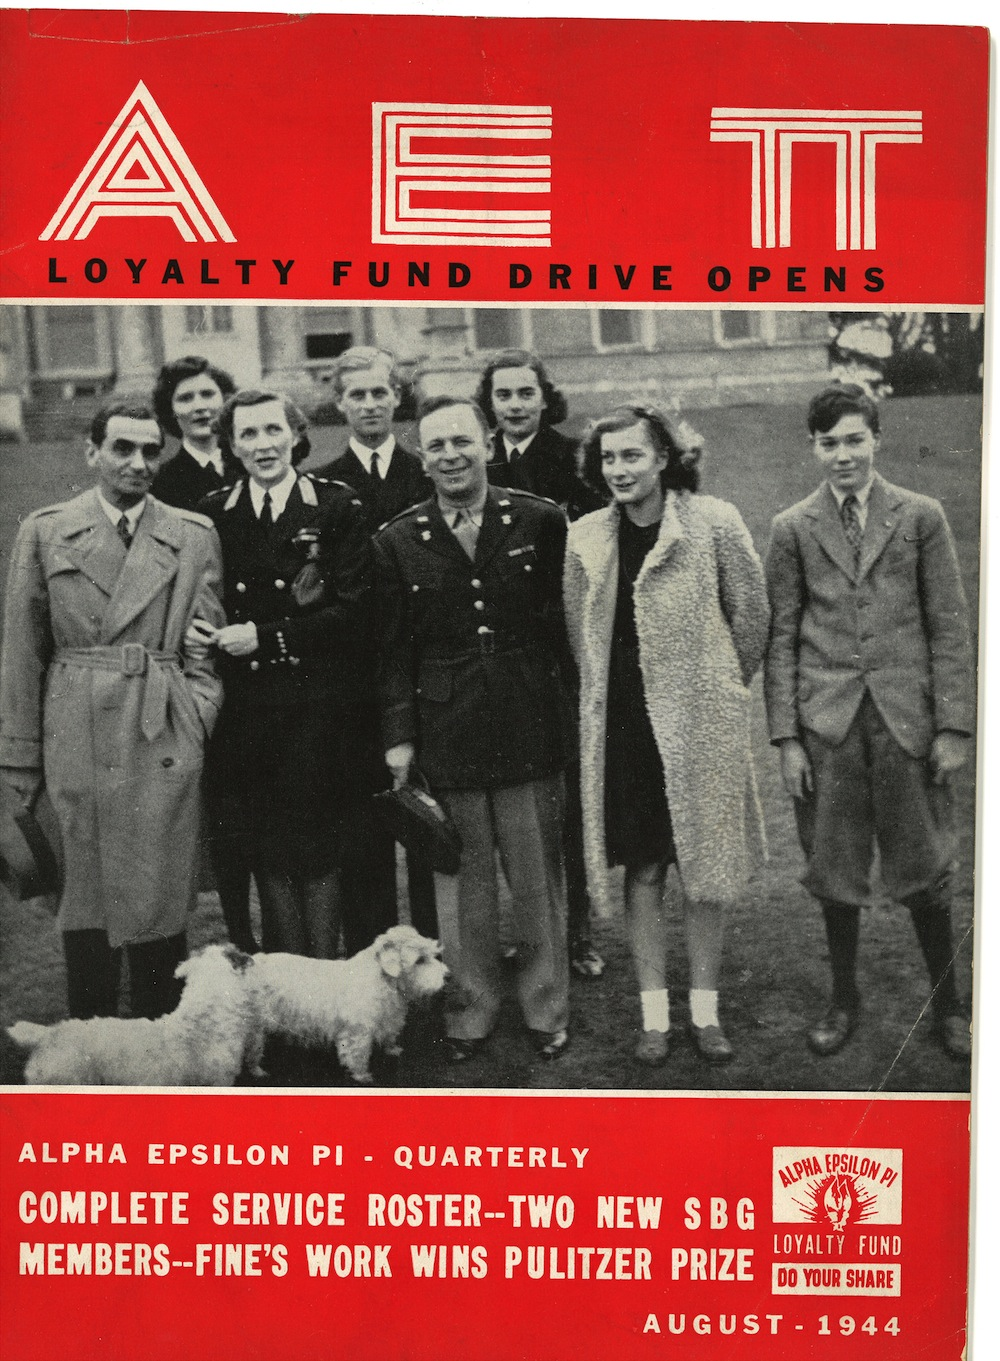 AEPi's History of Service – Jews in Green